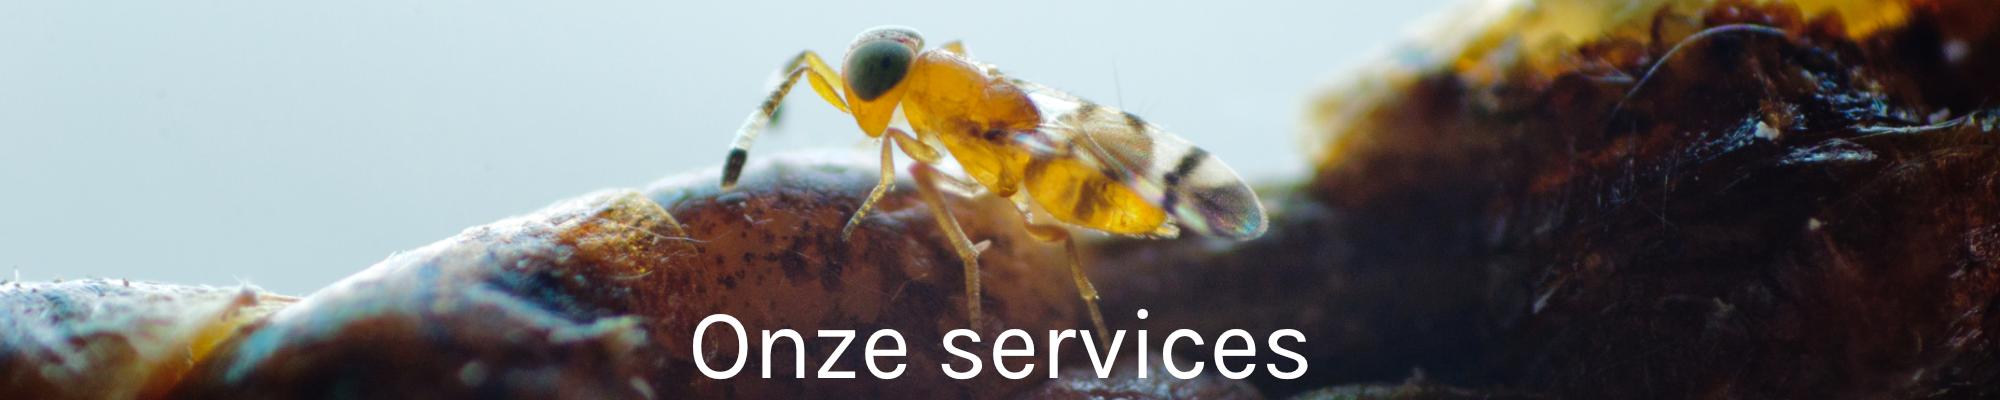 Onze services banner